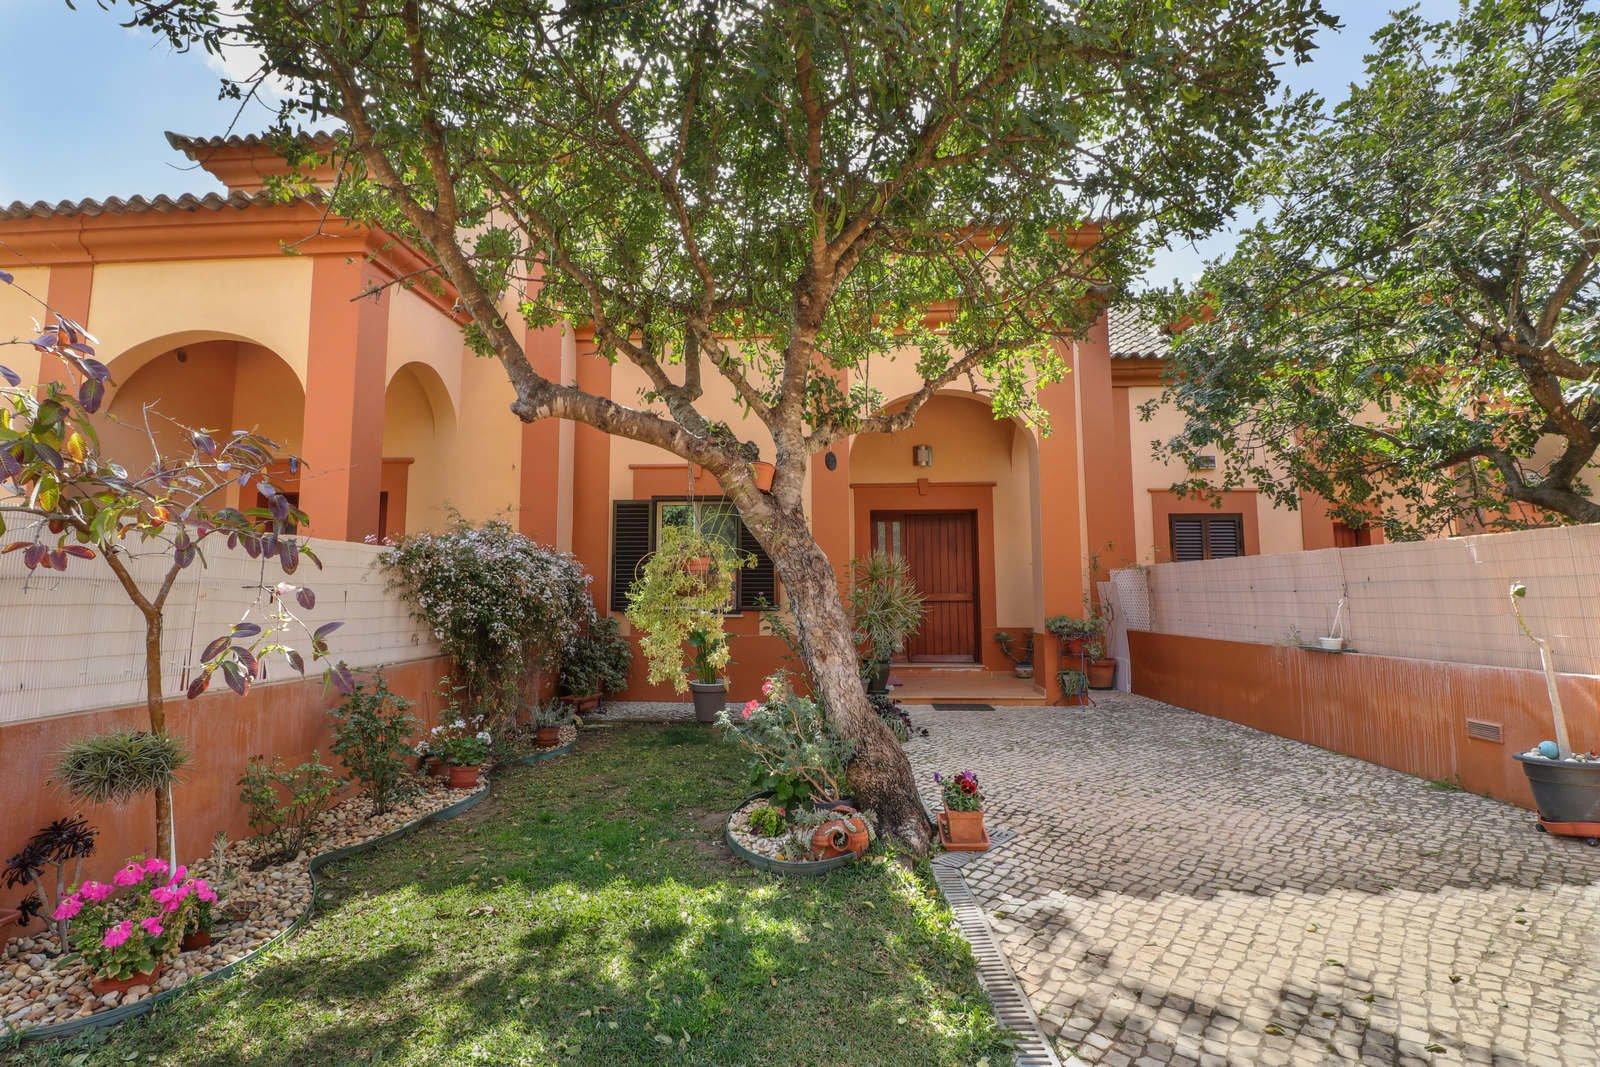 3 Bedroom Townhouse Loule, Central Algarve Ref: PV3628